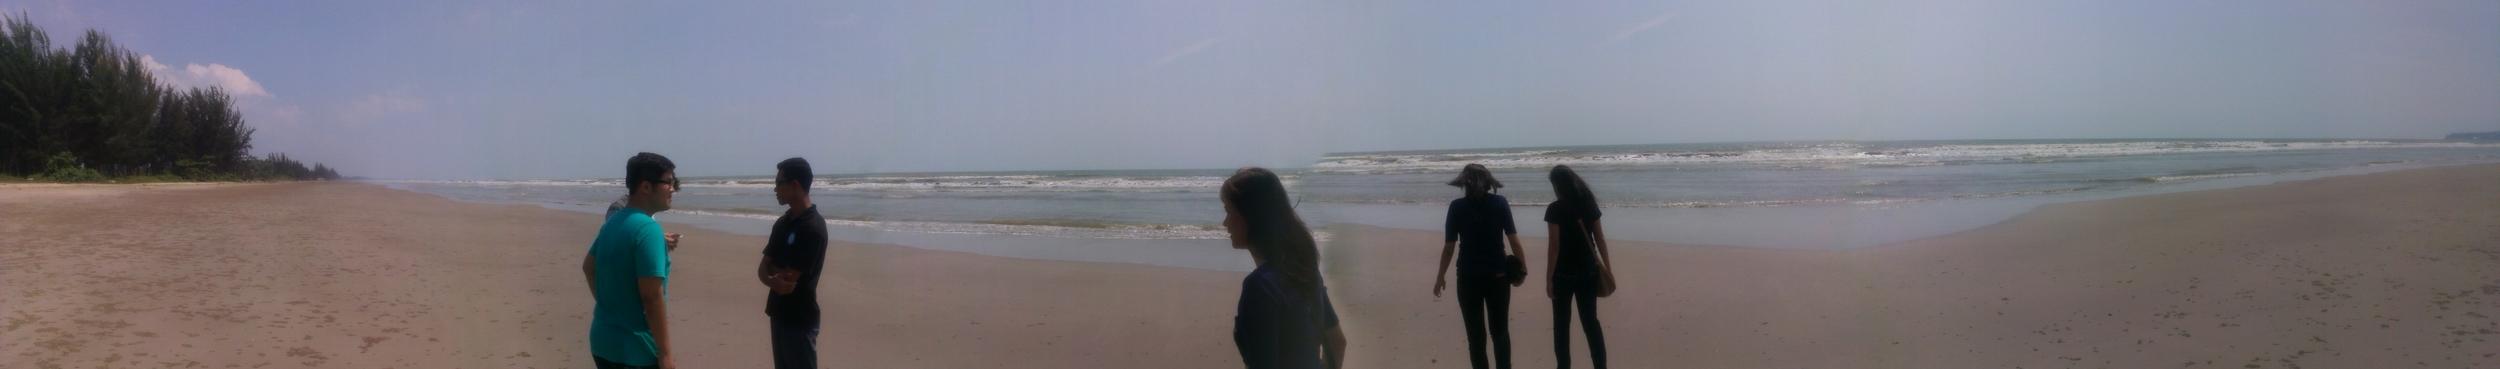 The teens take us to the South China Sea.